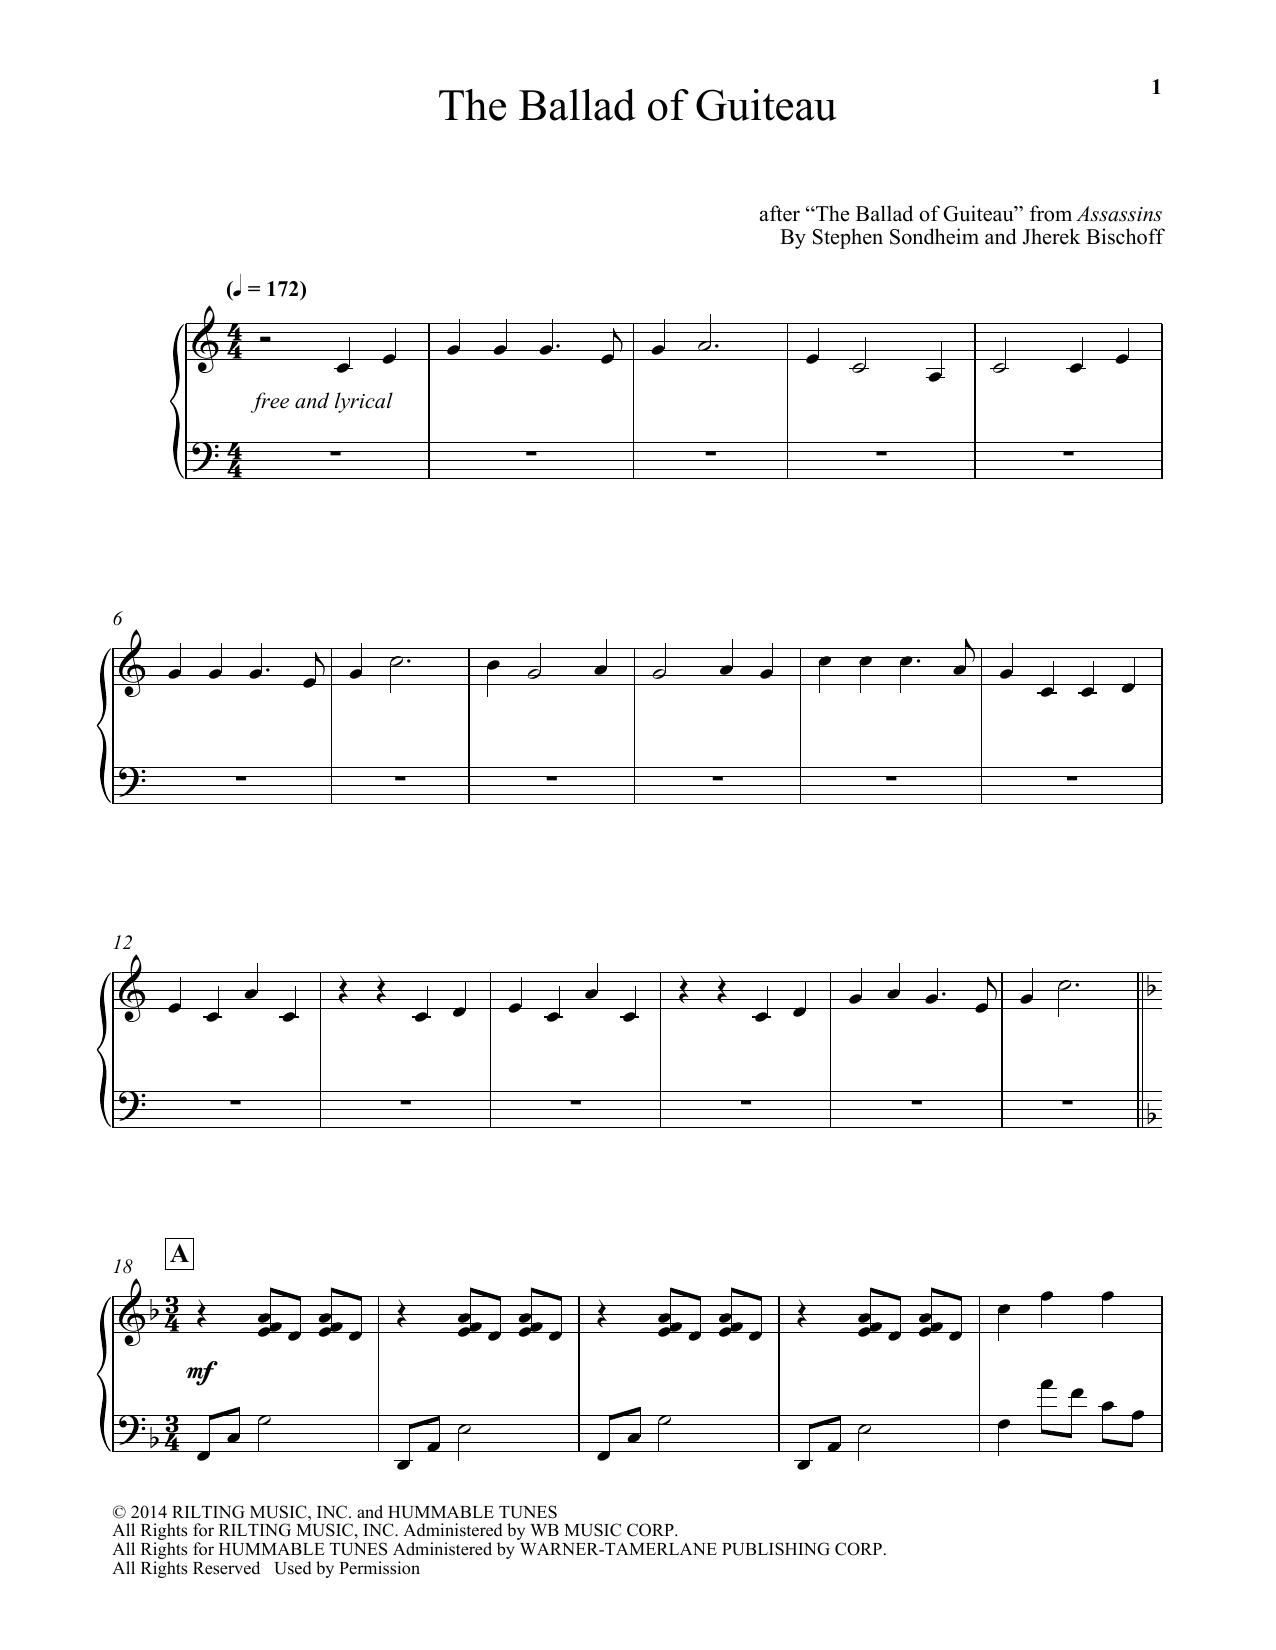 Stephen Sondheim The Ballad Of Guiteau (arr. Jherek Bischoff) sheet music notes and chords. Download Printable PDF.